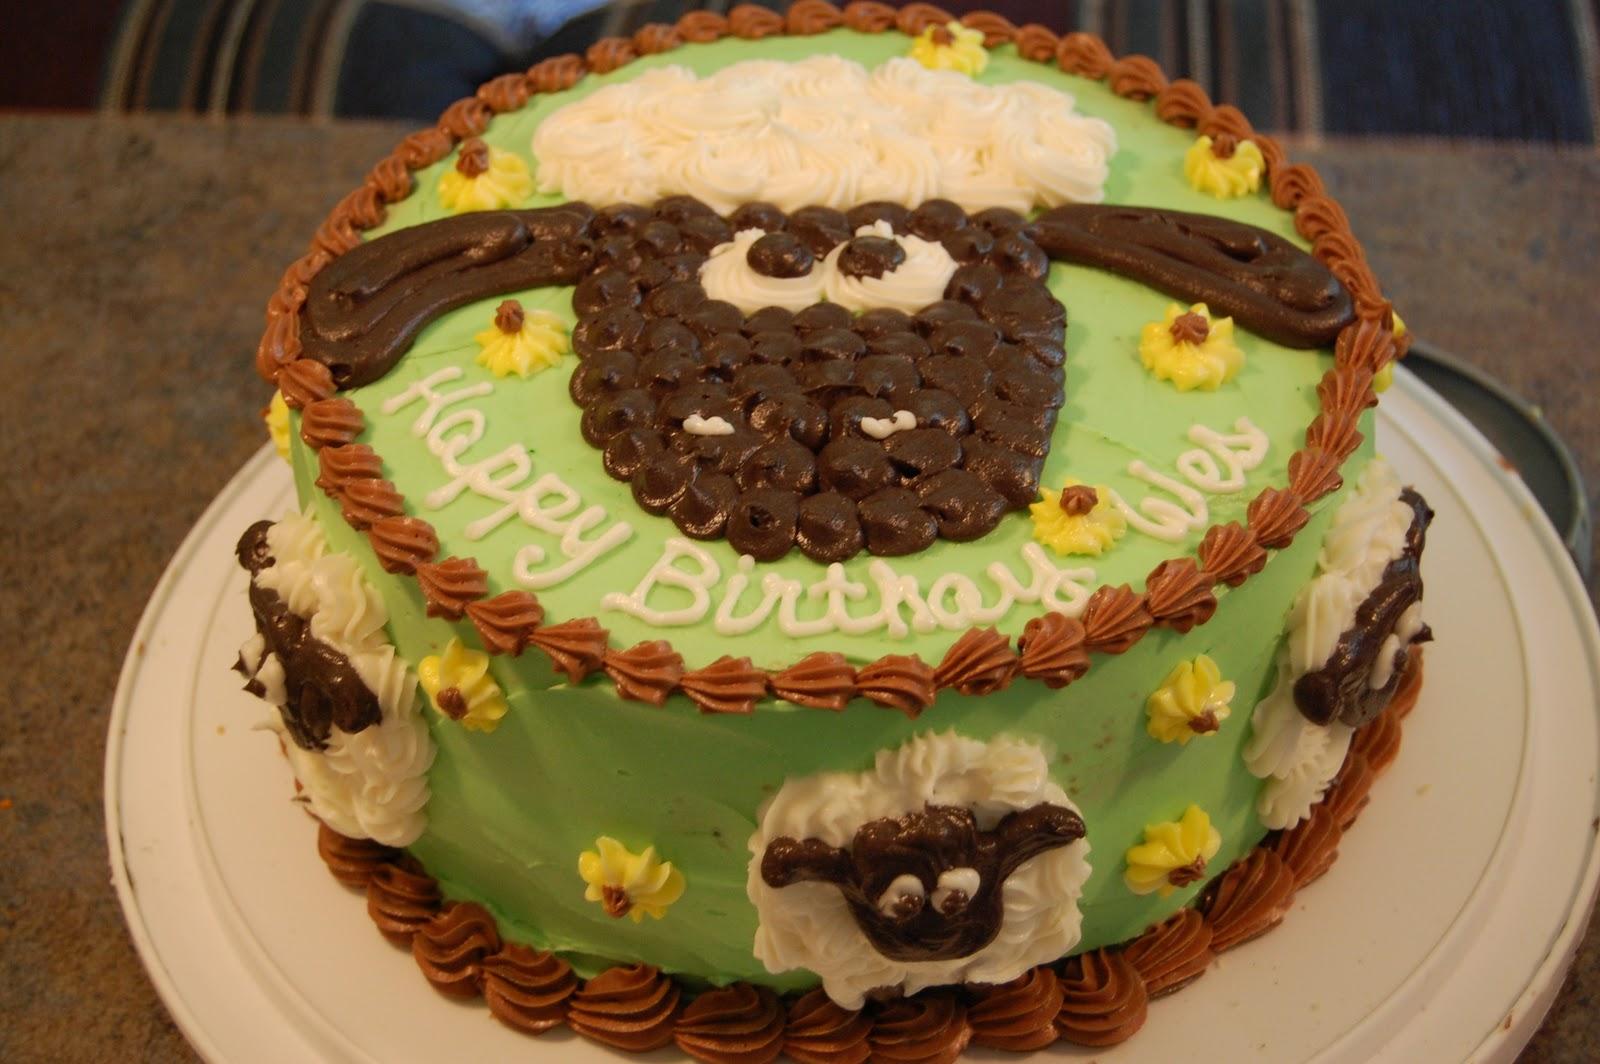 O Taste See Cakes Shaun The Sheep 2nd Birthday Cake